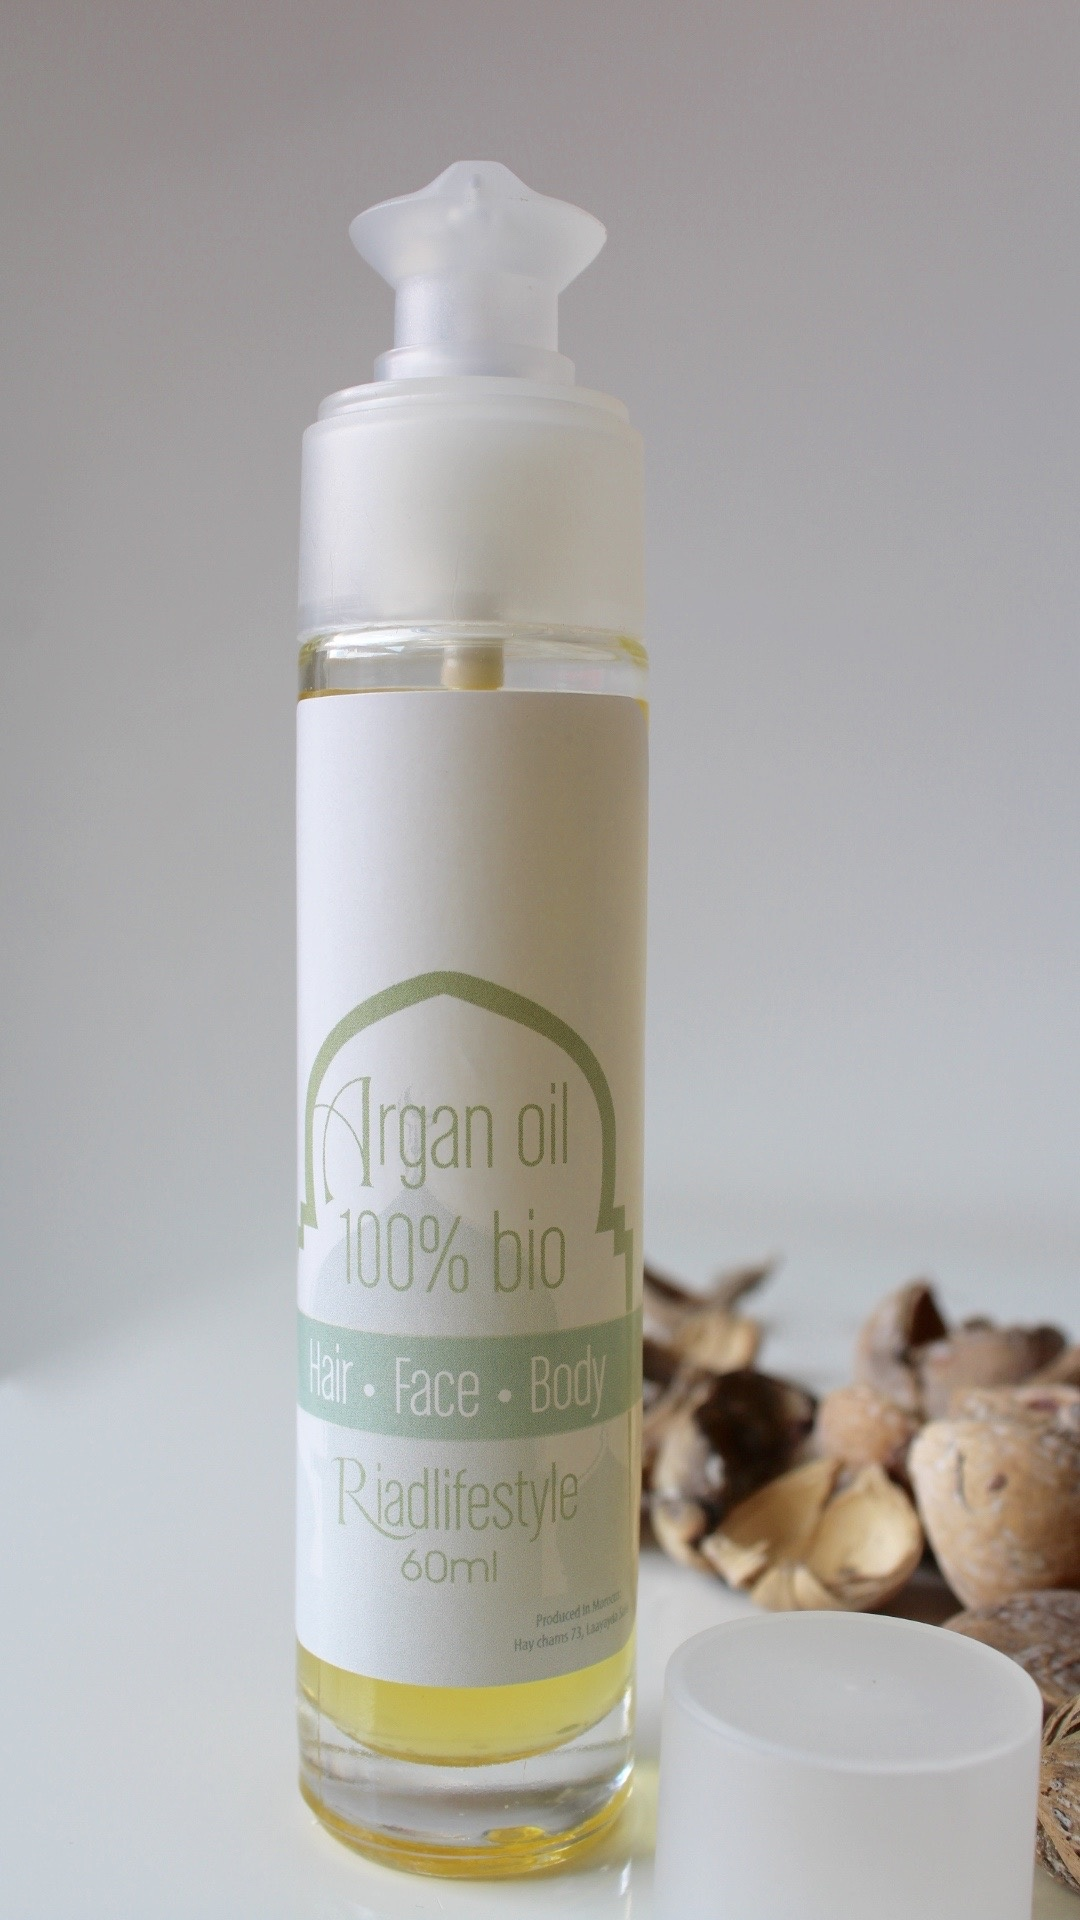 Riadlifestyle Argan oil 100% bio